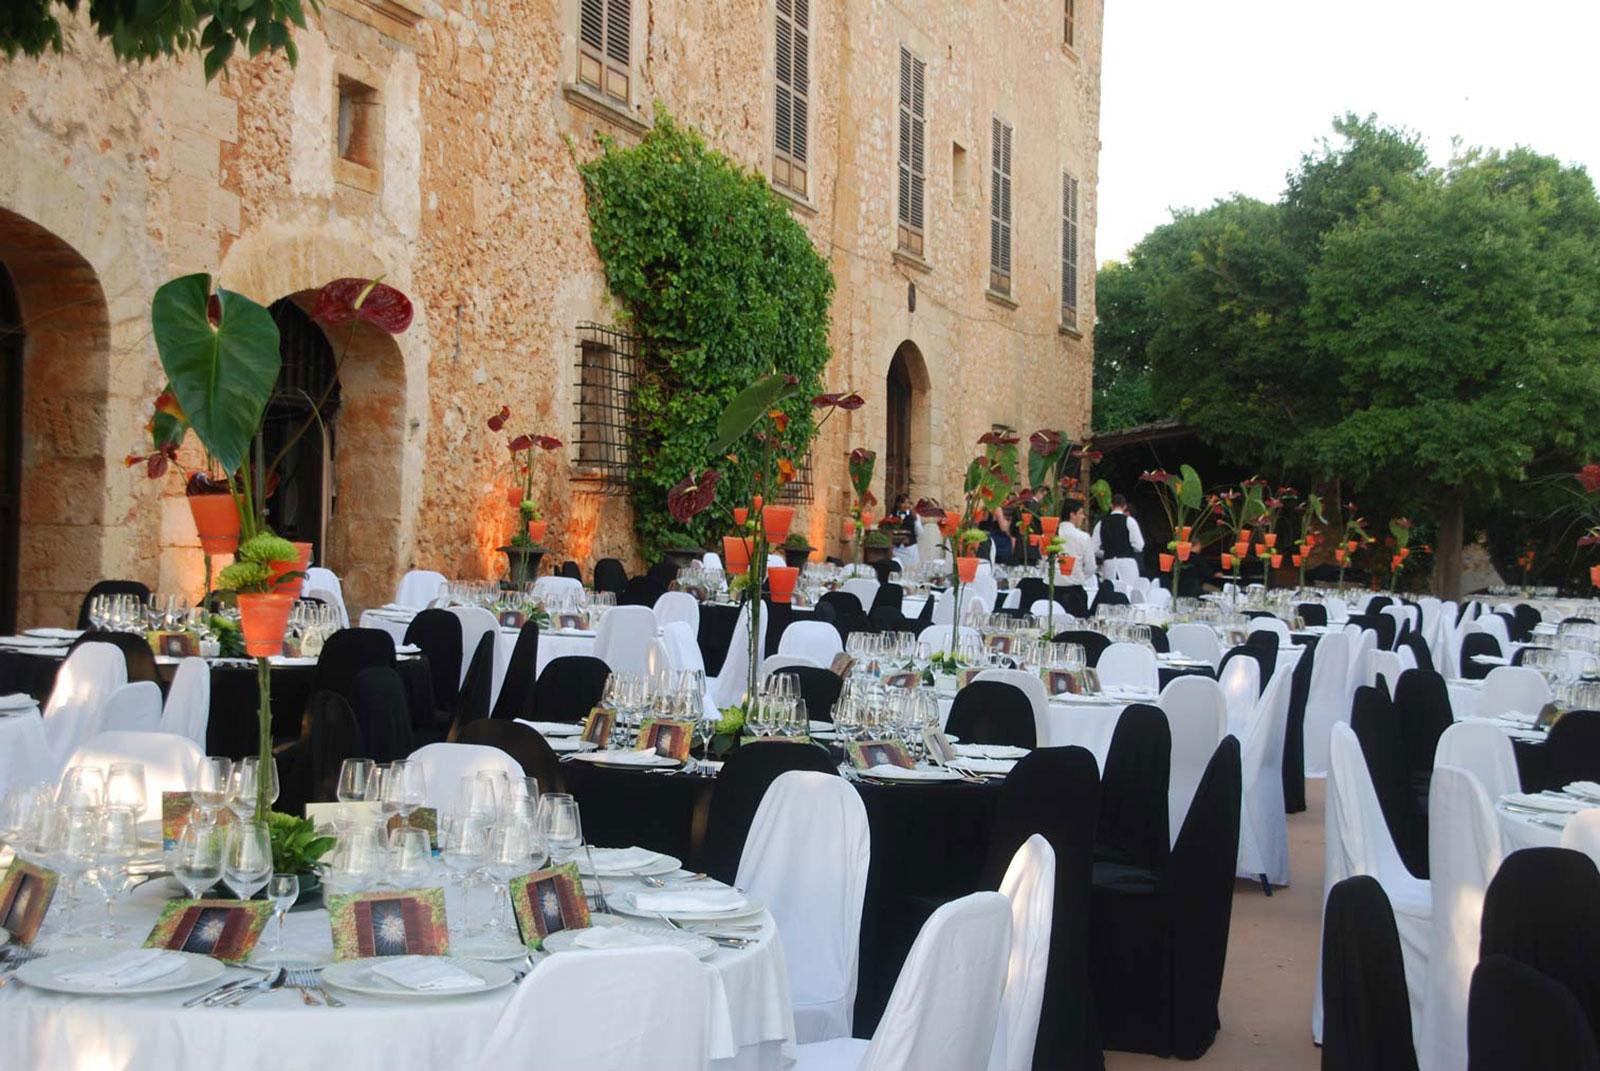 Gala-Dinner-Mallorca-Gala-Dinner-6